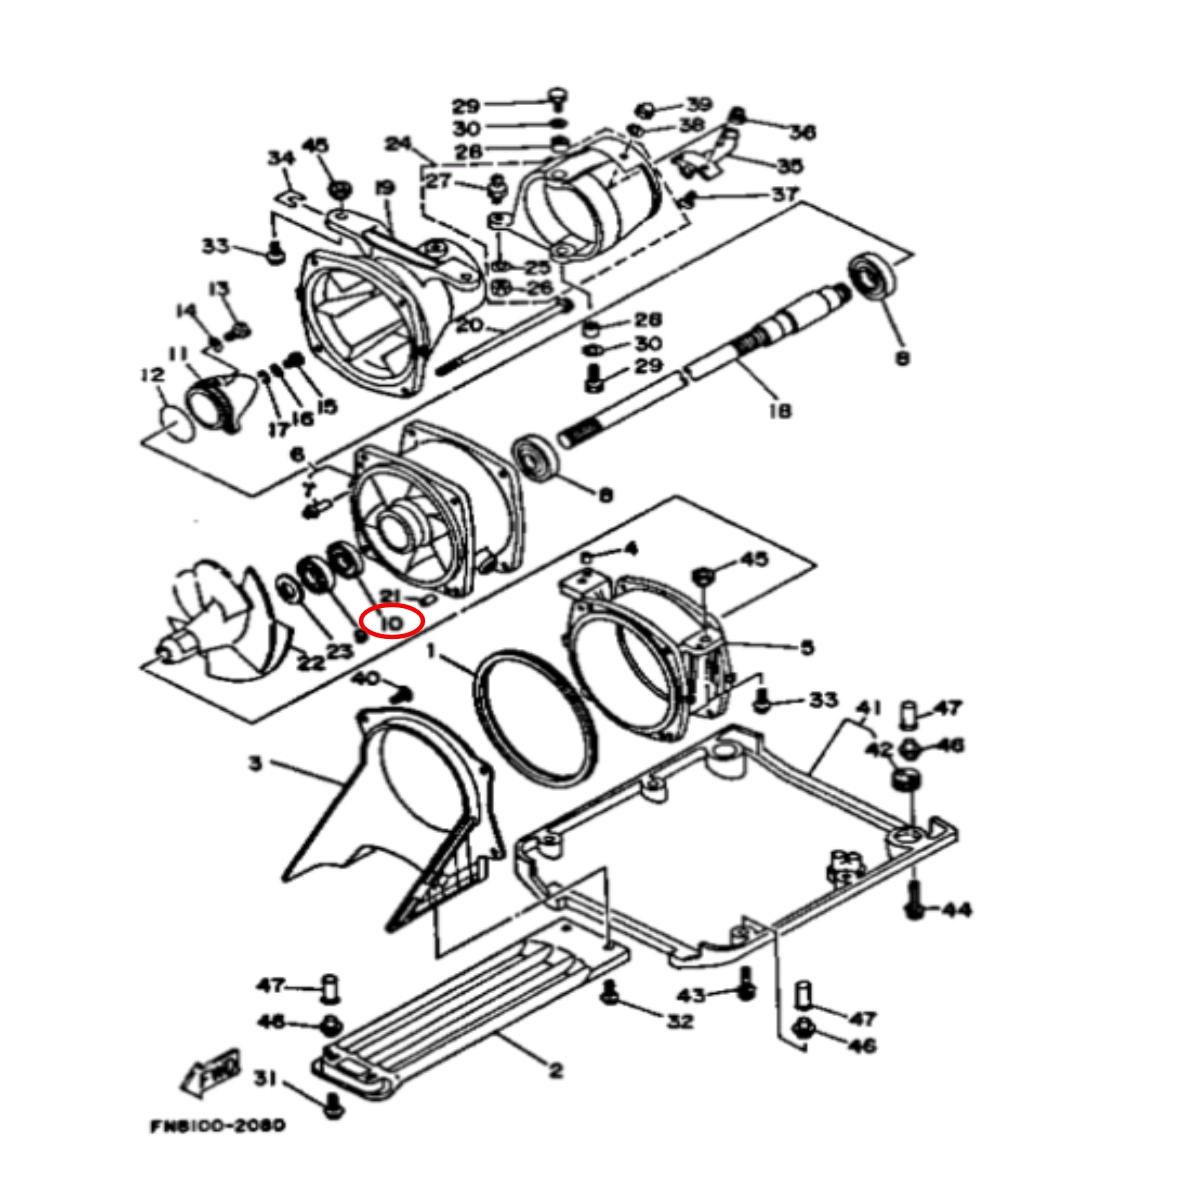 Retentor Turbina para Jet Ski Yamaha Nacional Dianteiro  - Radical Peças - Peças para Jet Ski